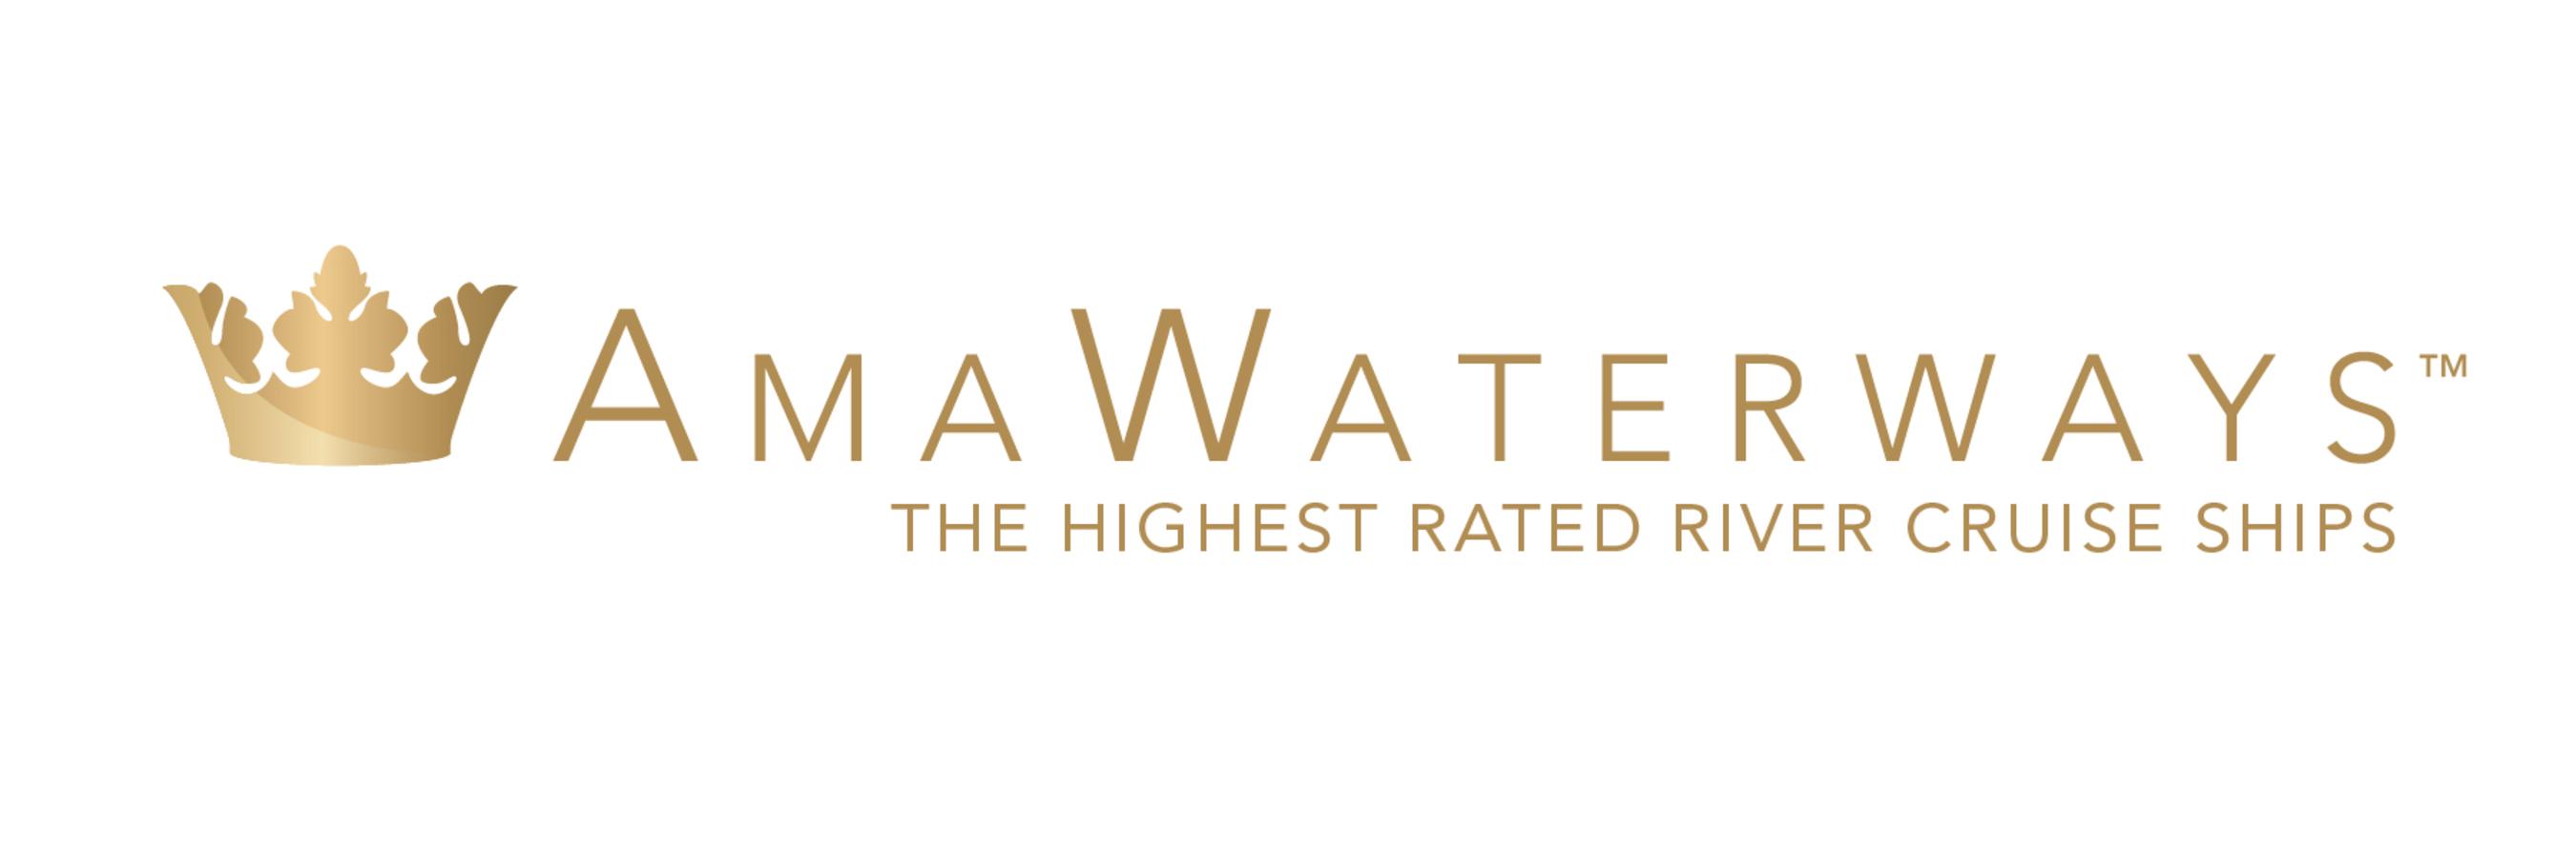 AmaWaterways logo